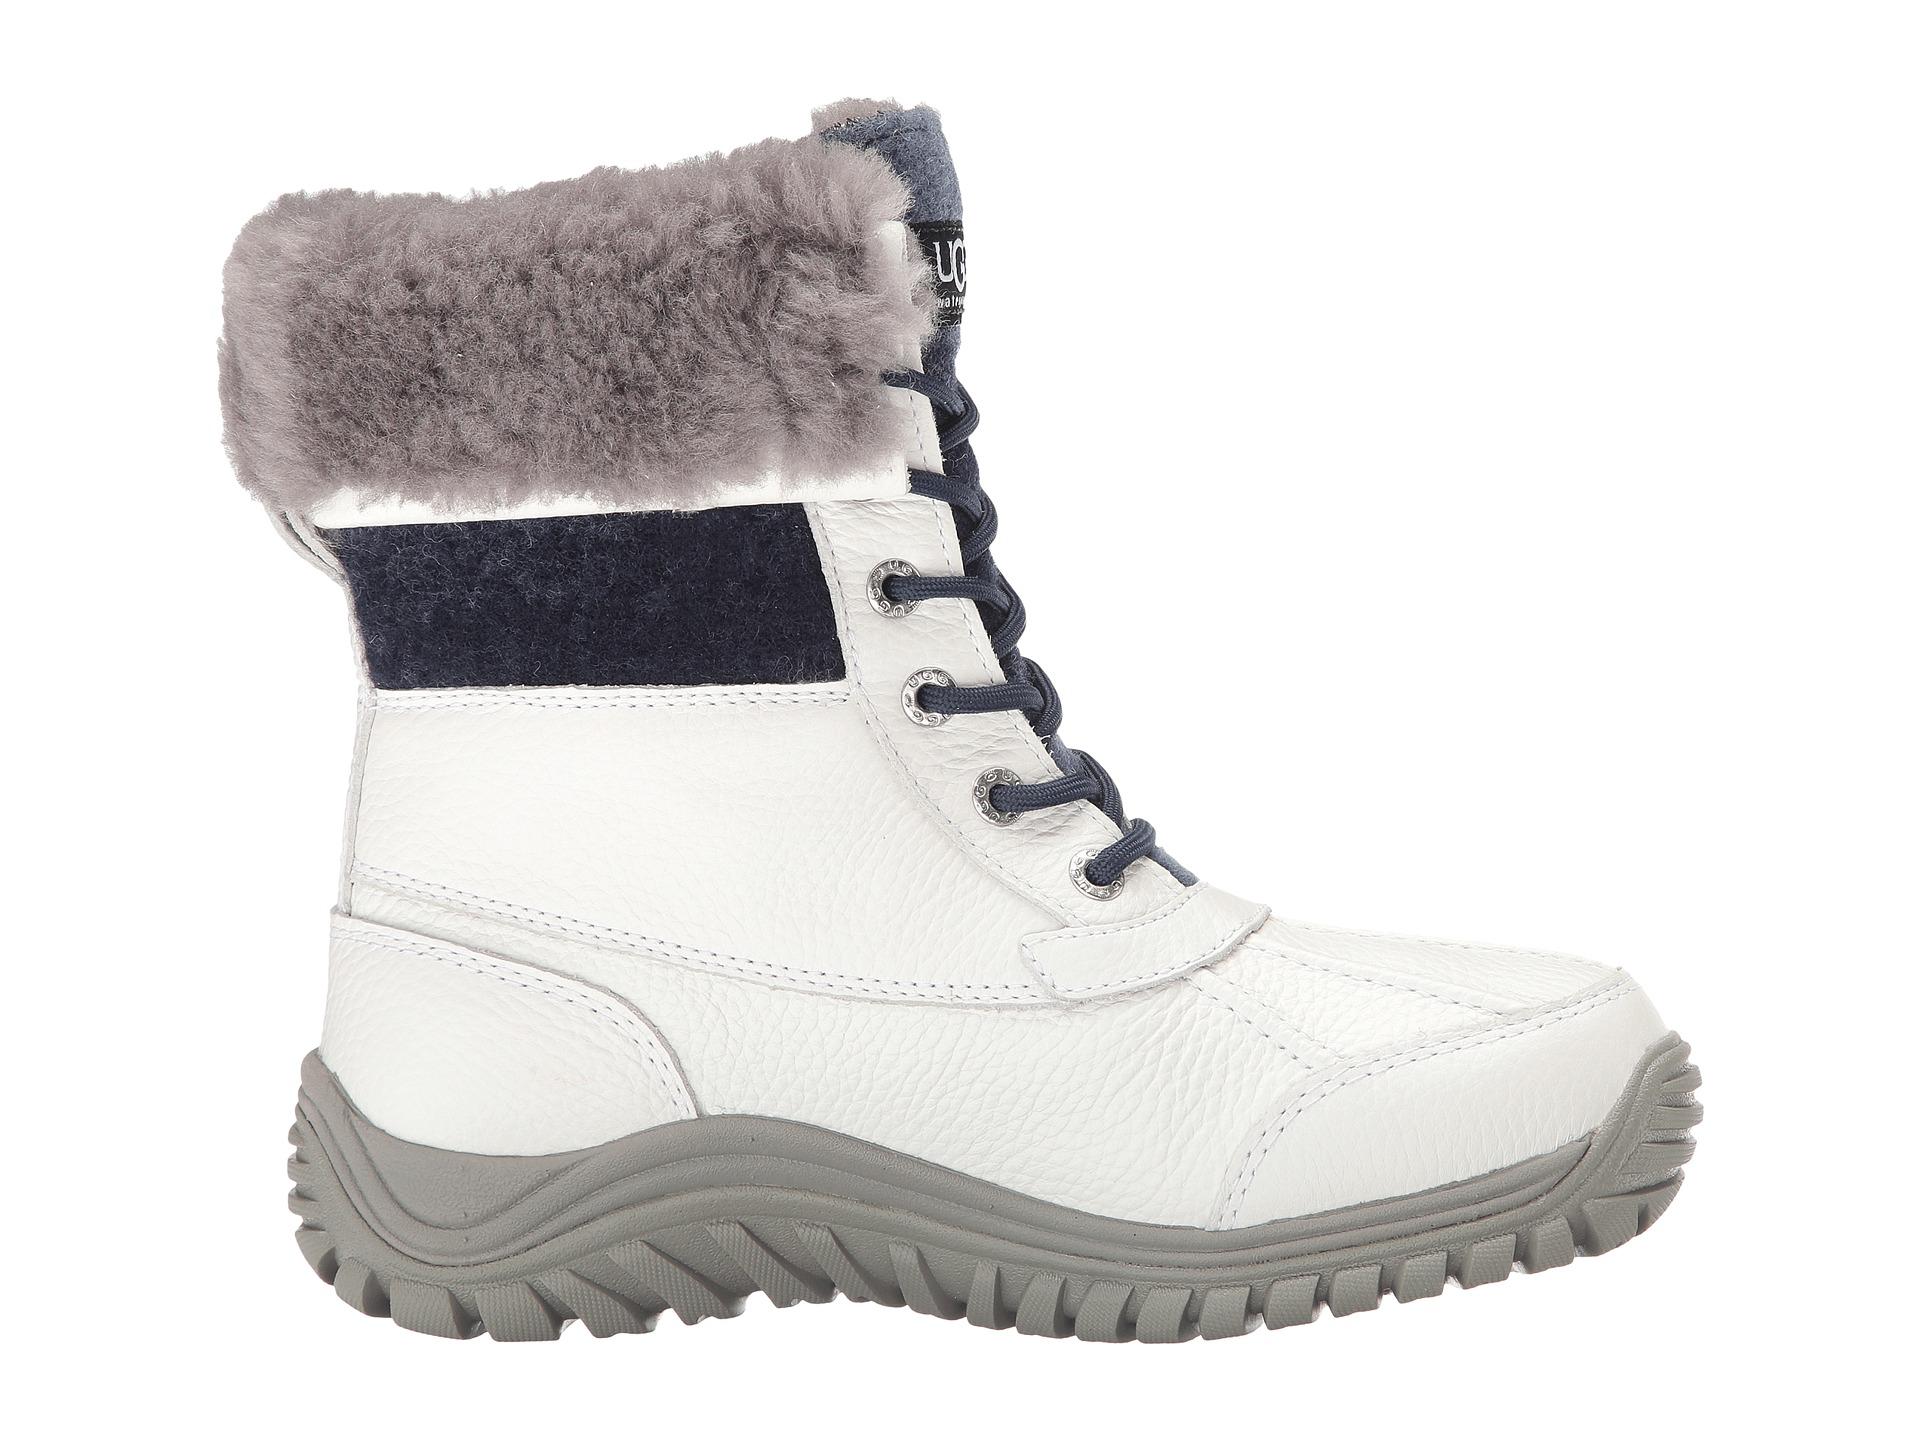 c3c86b1cc30 Adirondack 11 Ugg Boots - cheap watches mgc-gas.com